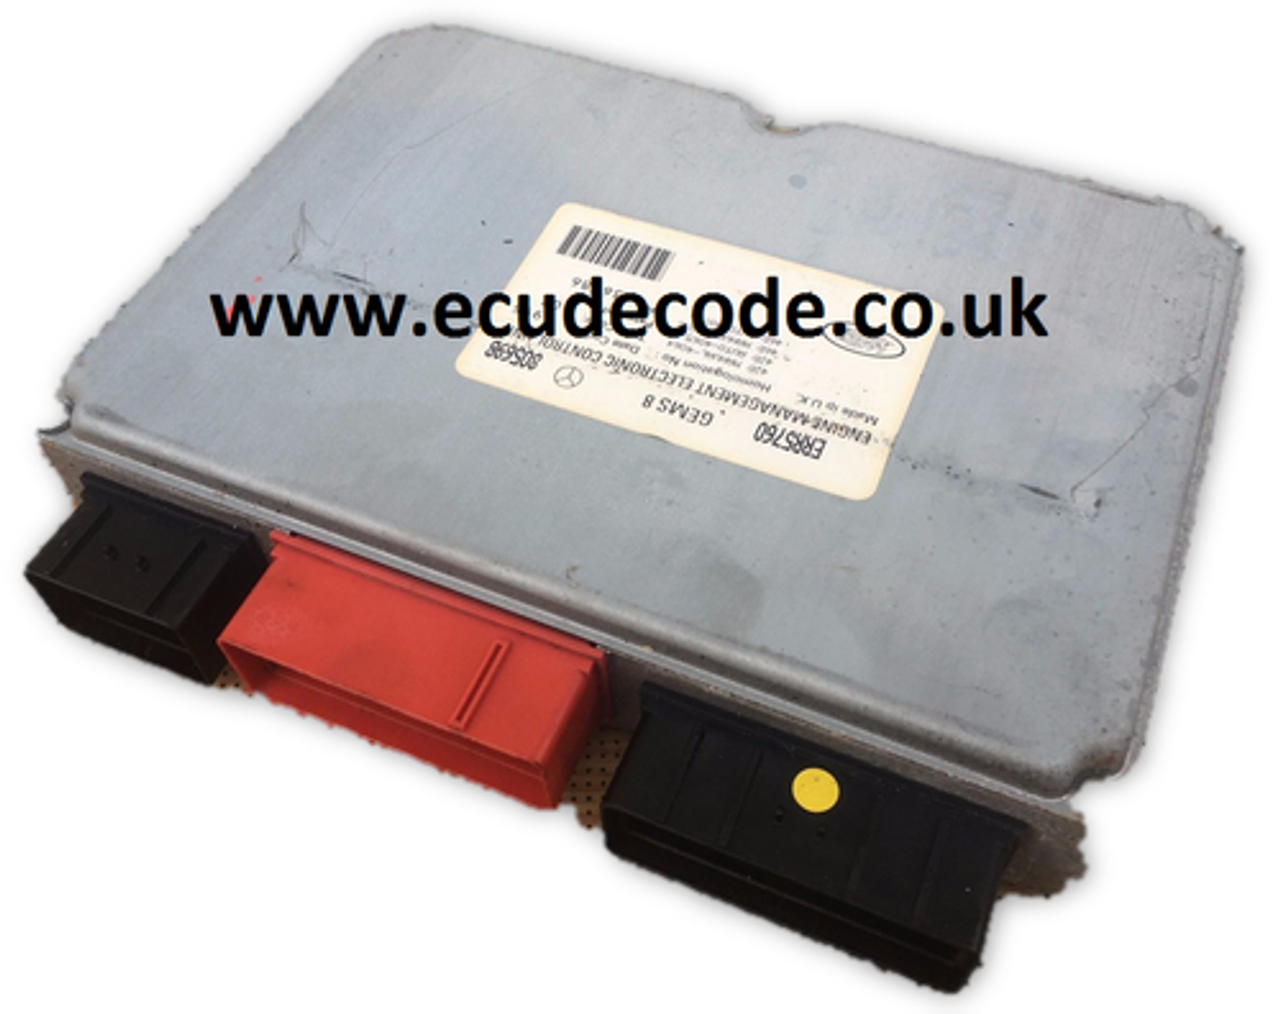 ERR5760 / GEMS 8.2 / 80569A / P38 Range Rover Petrol ECU Plug & Play.